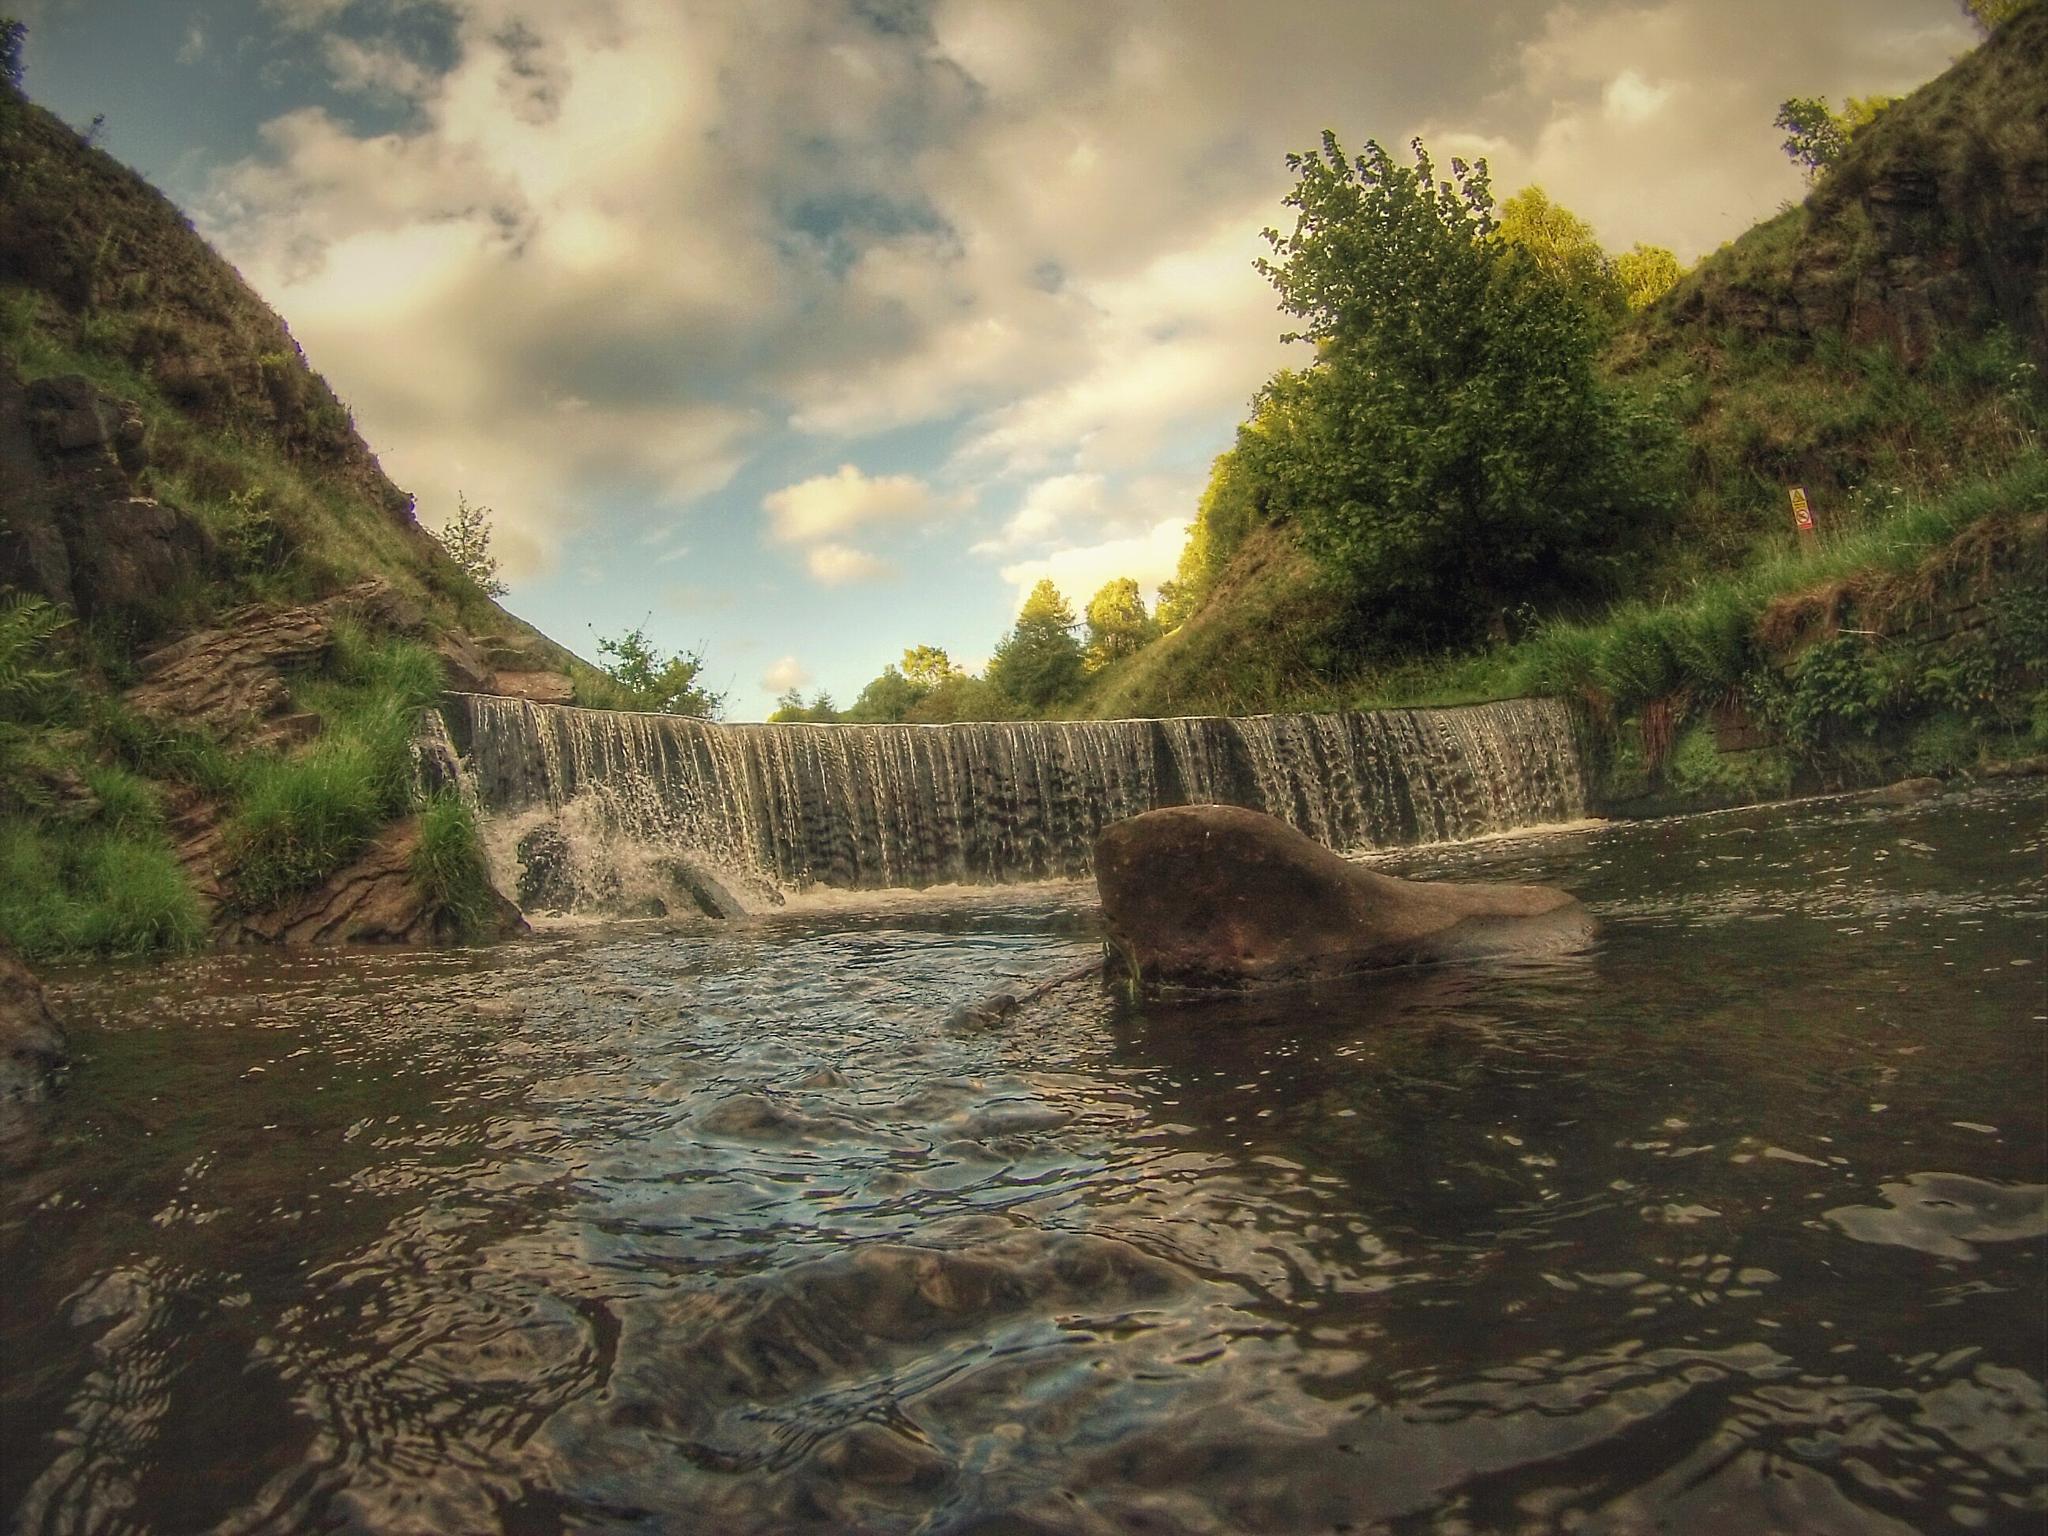 Waterfall by ralphadam85